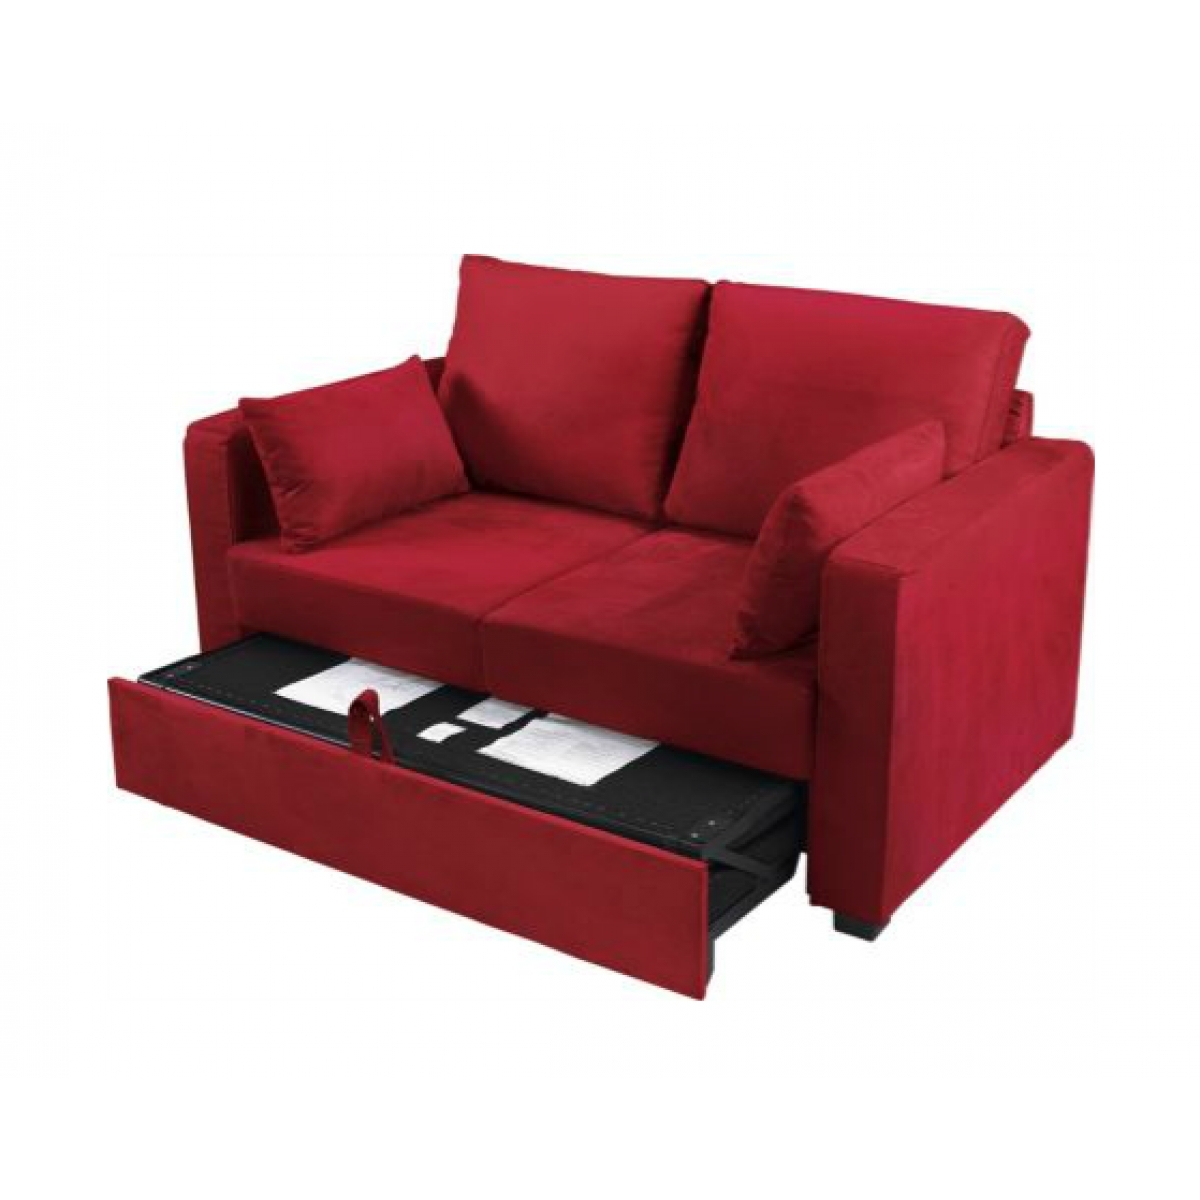 Stunning Apartment Size Sleeper Sofa Images – Liltigertoo For Apartment Size Sofas (Image 9 of 10)